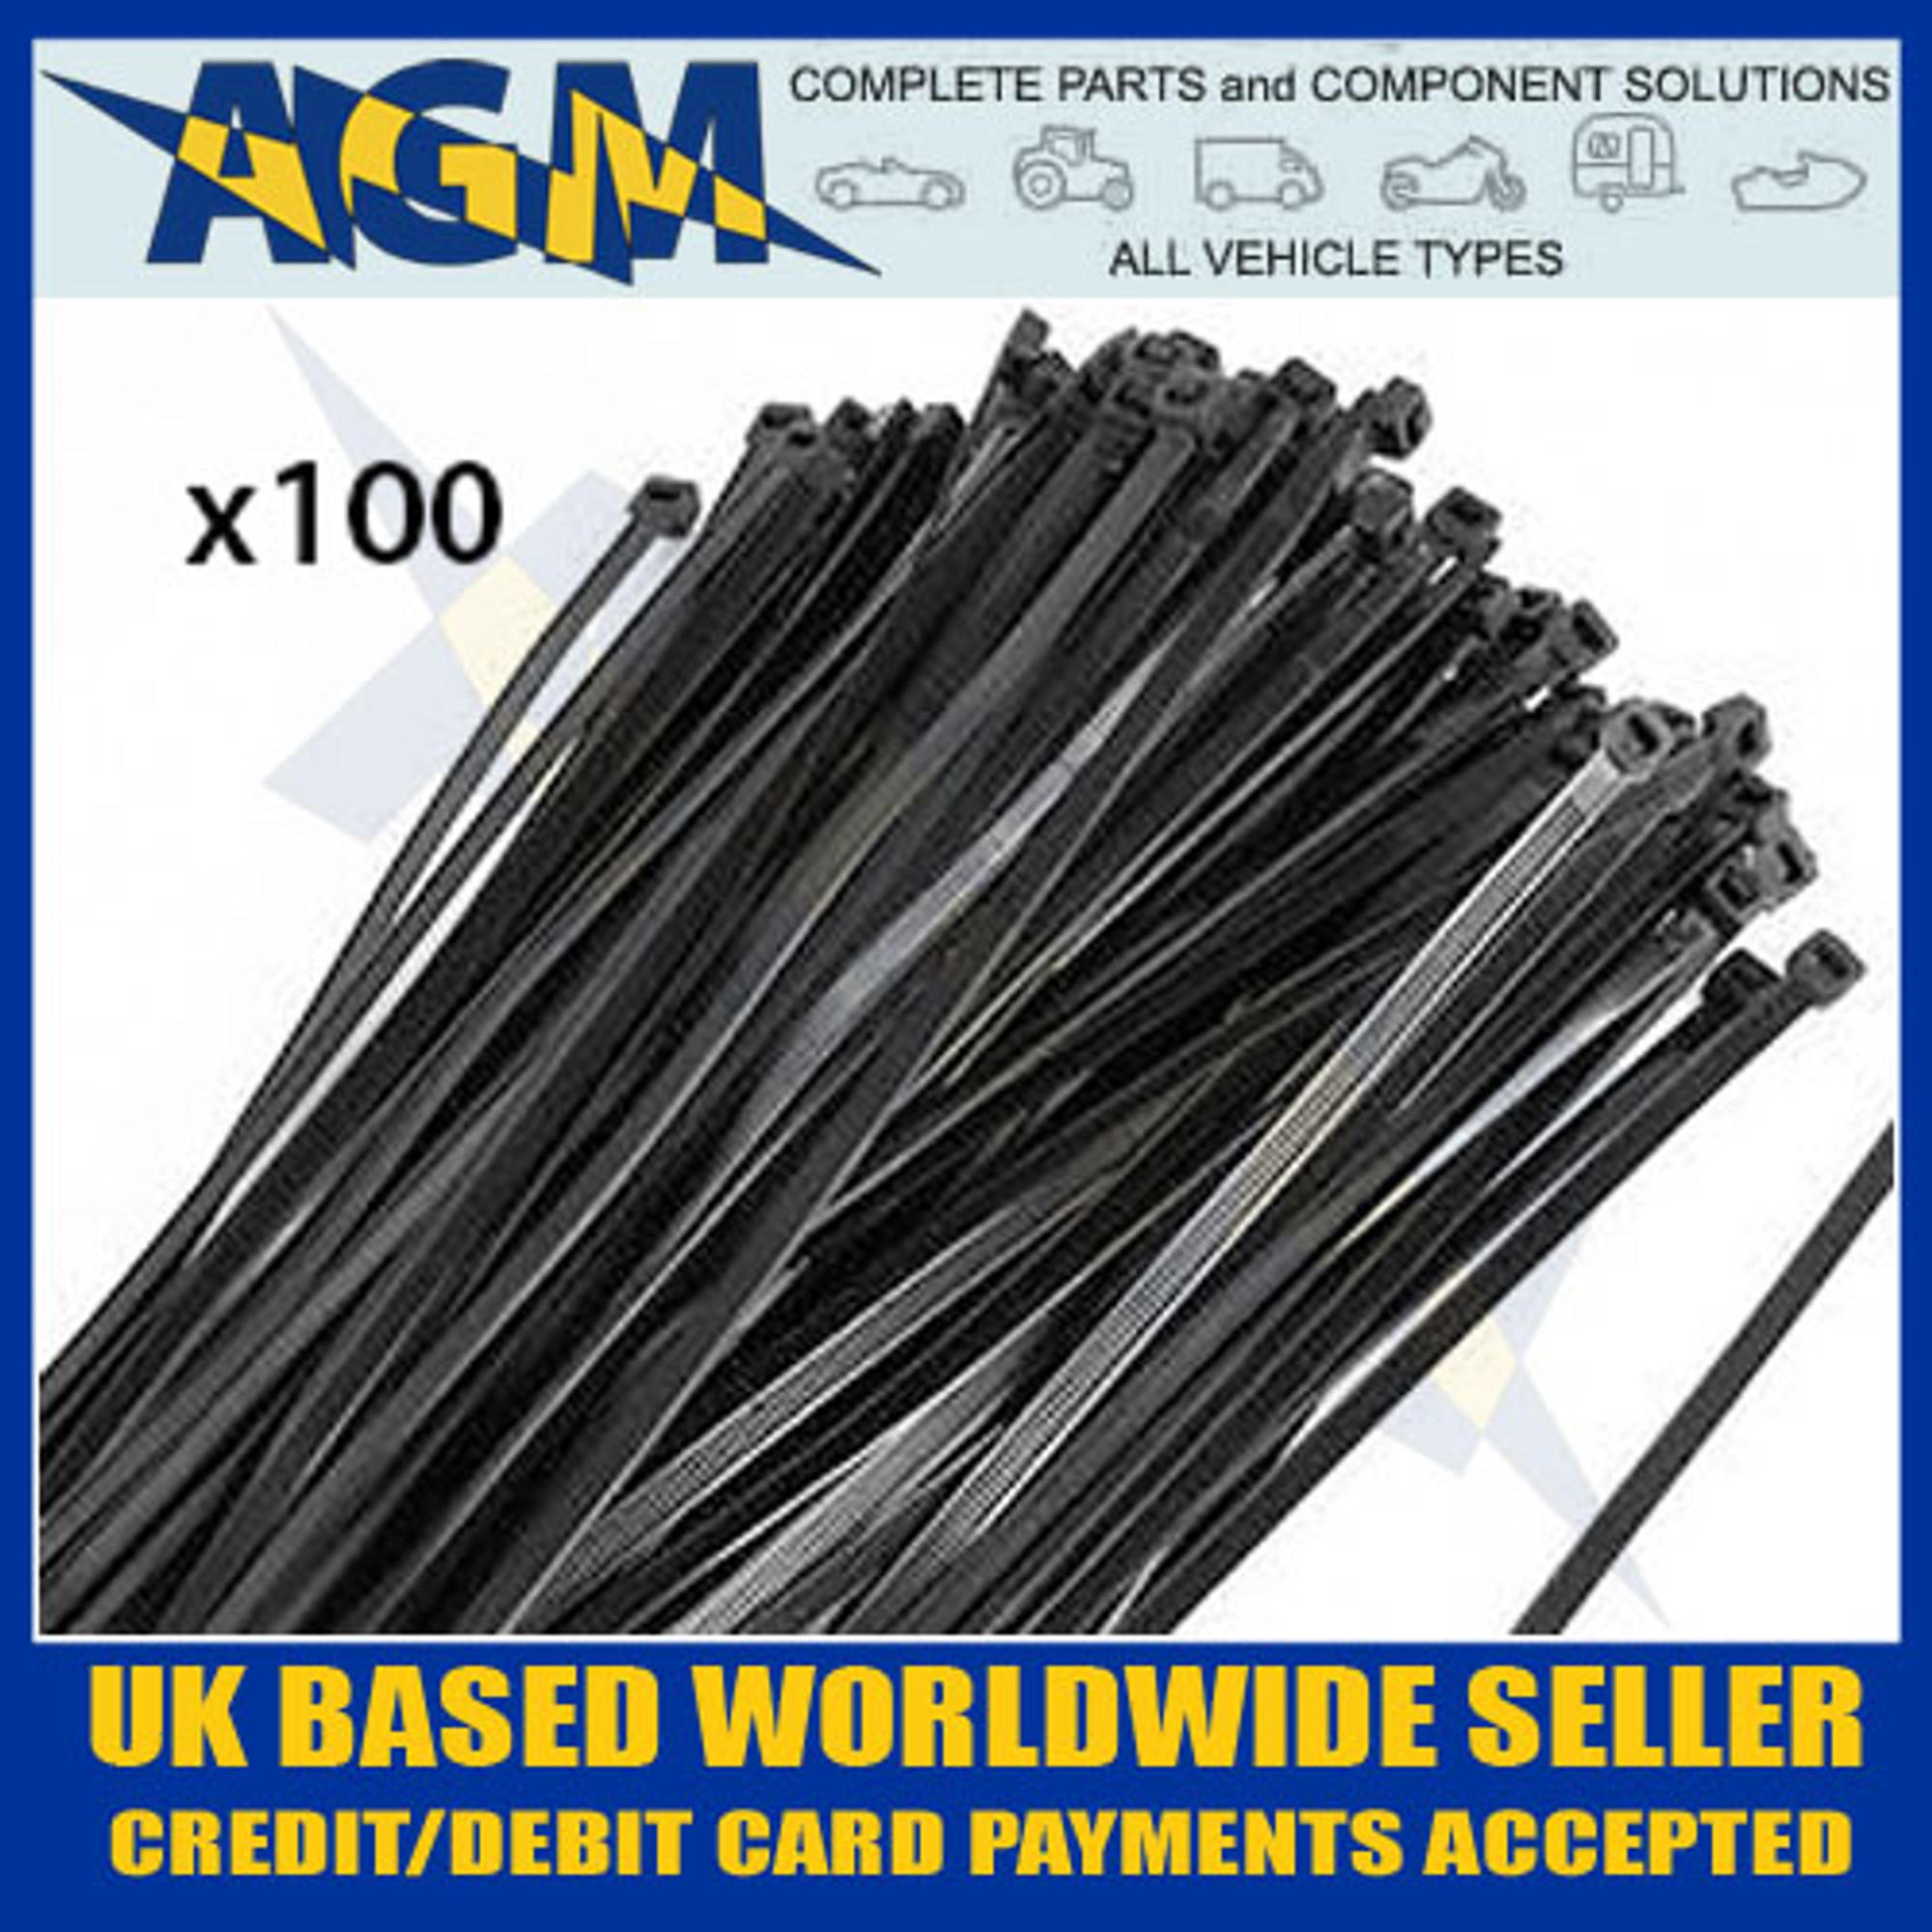 ca119ddbc6bd High Quality, Heavy Duty 300mm x 4.8mm Black Cable Ties x100 12